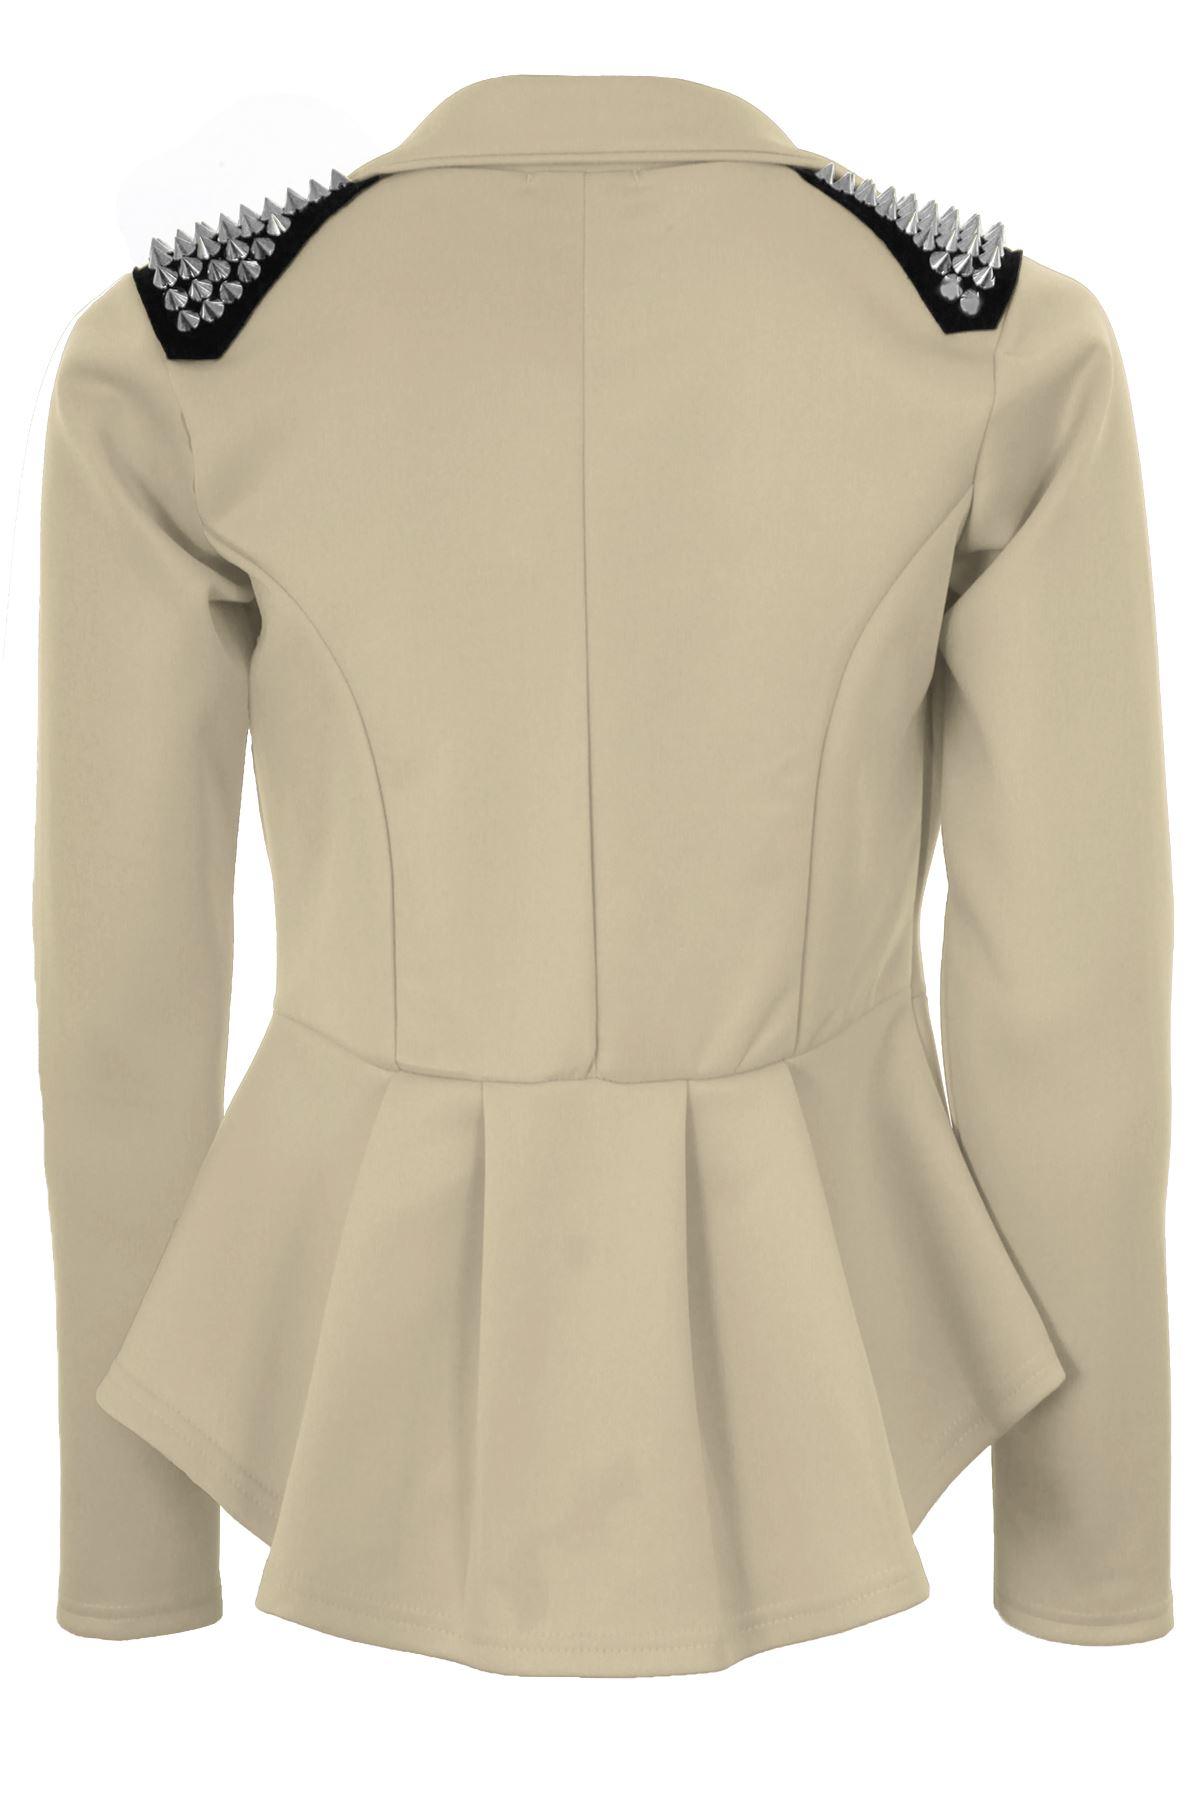 Femmes Haute Basse spike épaule shift frill peplum plissé mesdames blazer jacket